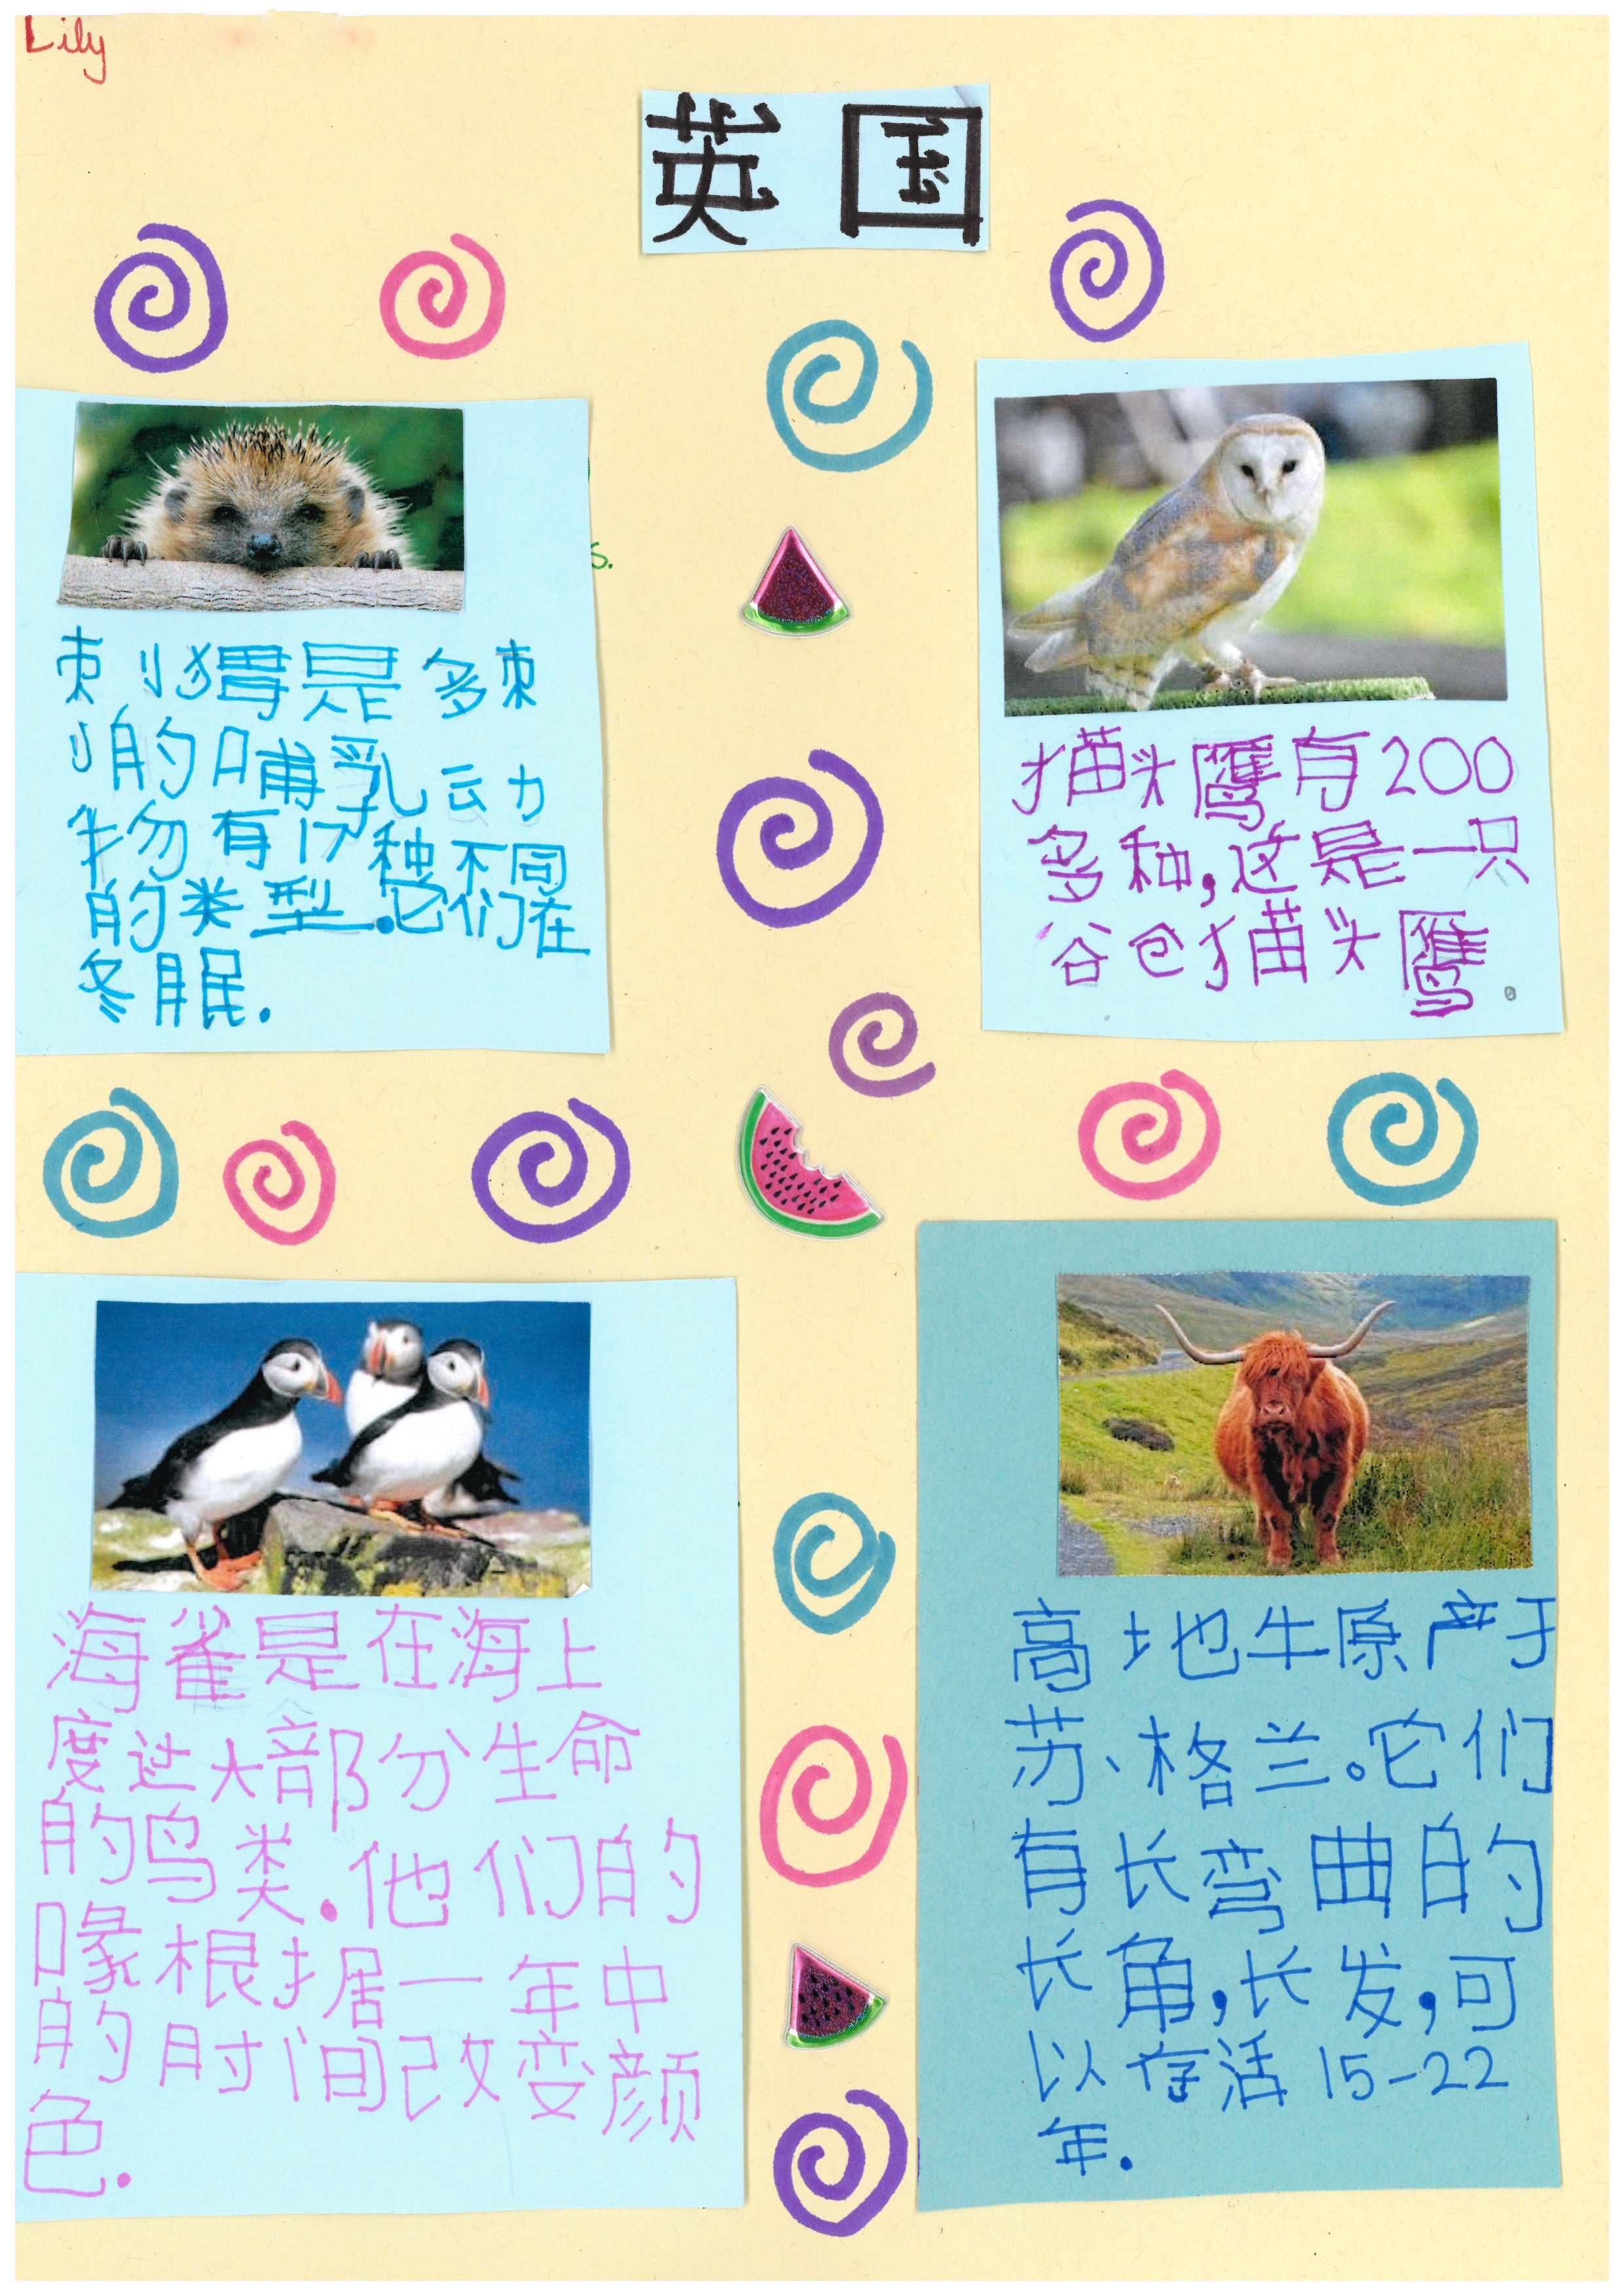 Taiwan pen pals